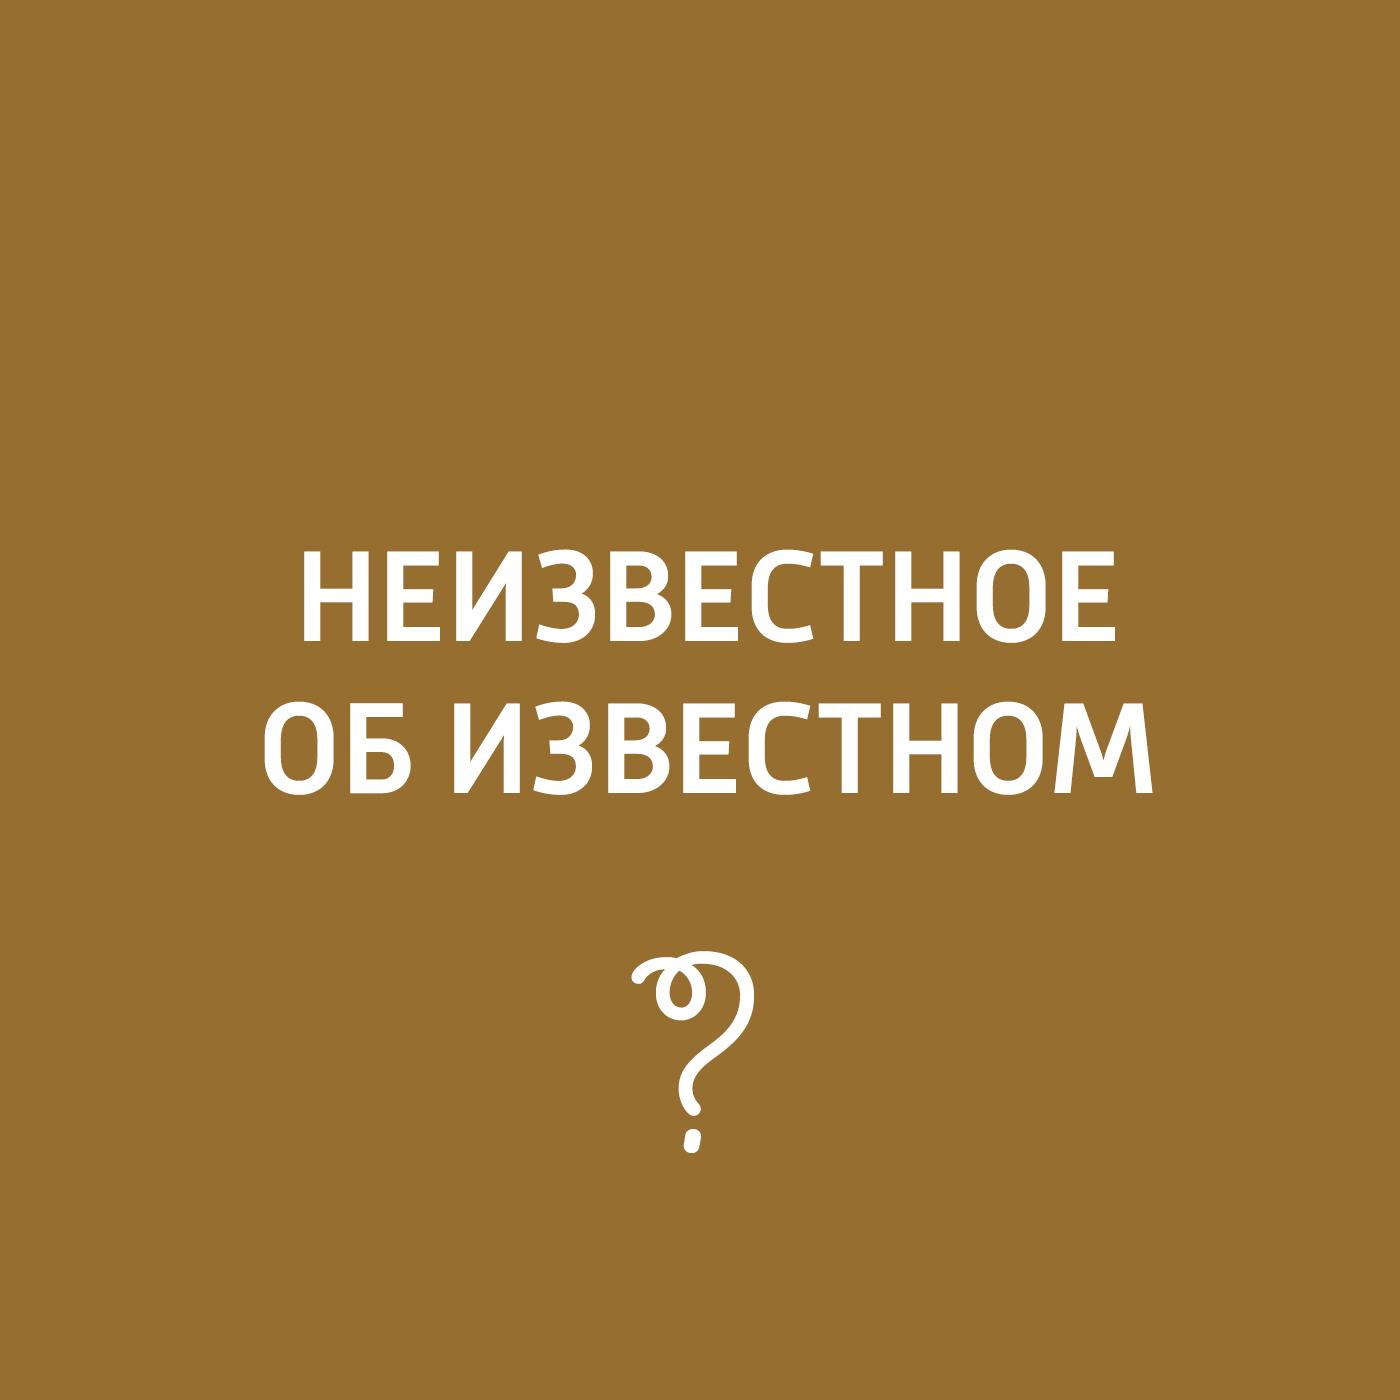 Творческий коллектив программы «Пора домой» Пётр Яковлевич Чаадаев п я чаадаев п я чаадаев сочинения